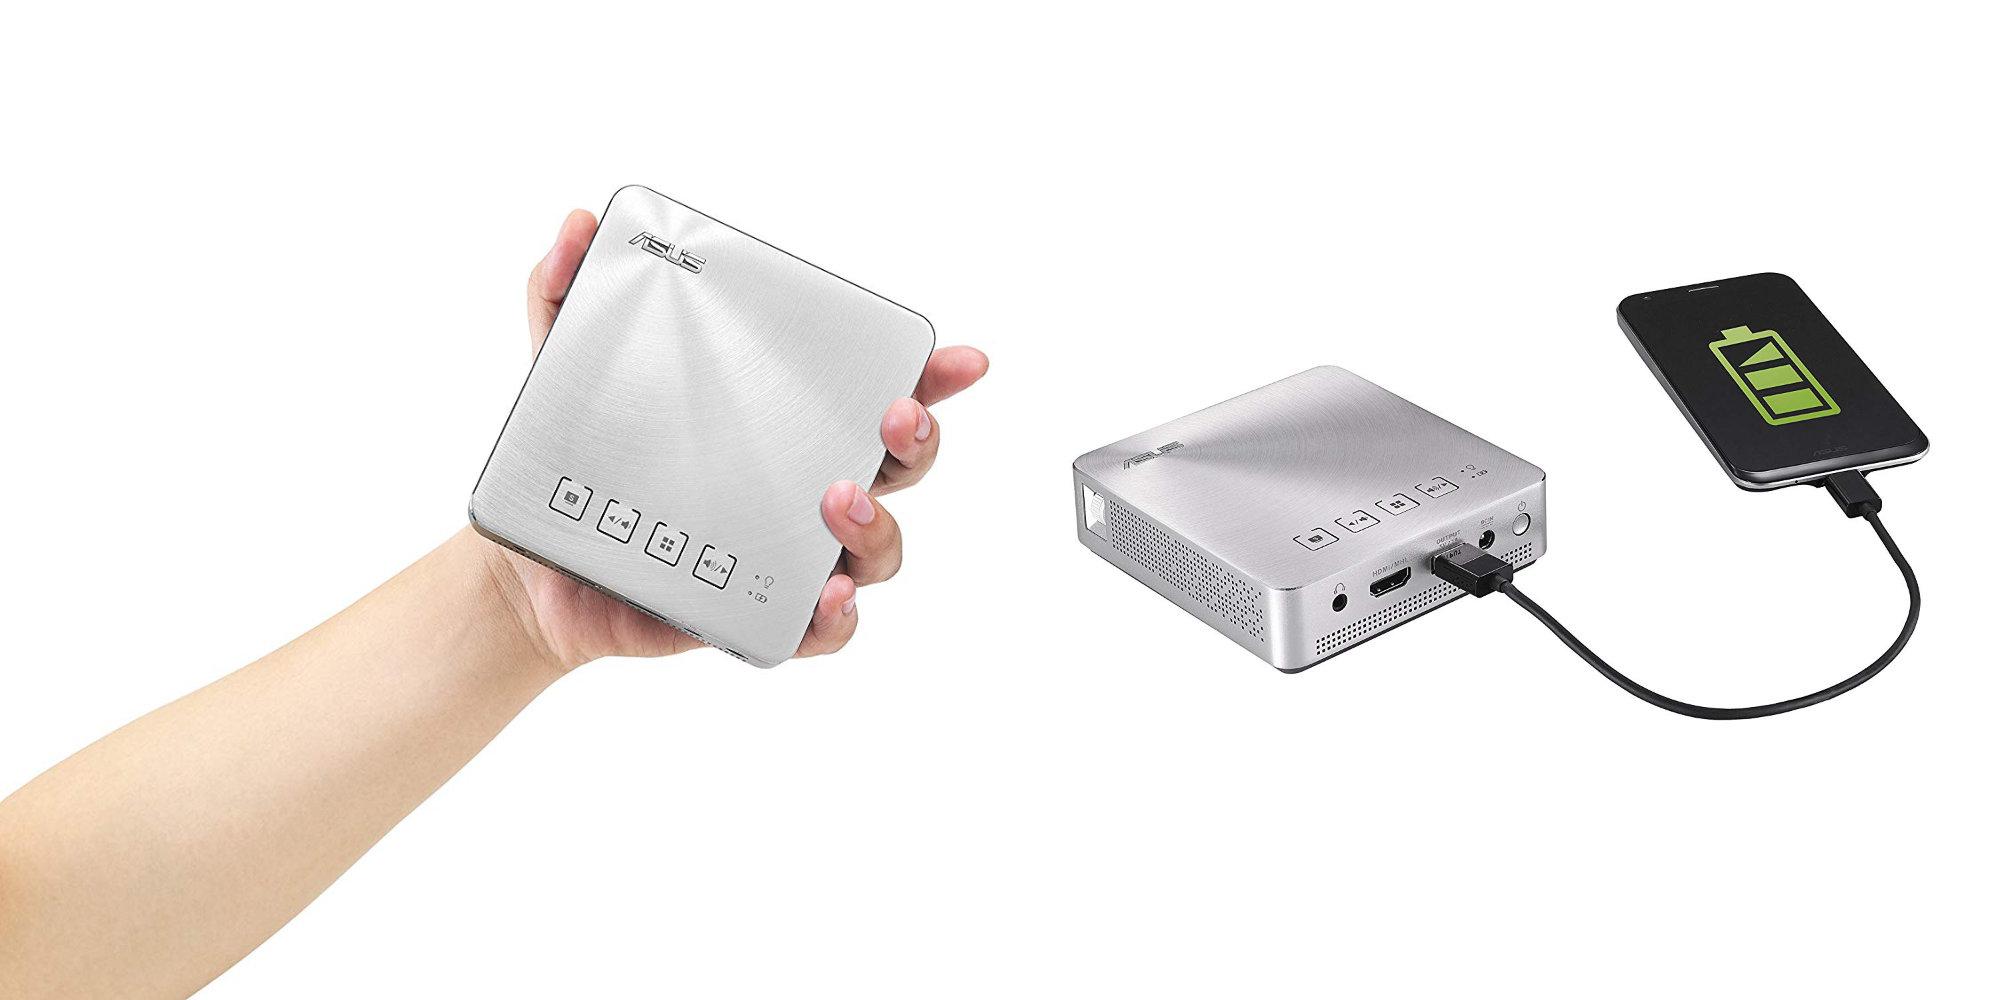 ASUS' Short Throw Pocket Projector duals as a power bank: $240 at Amazon (Reg. $319)